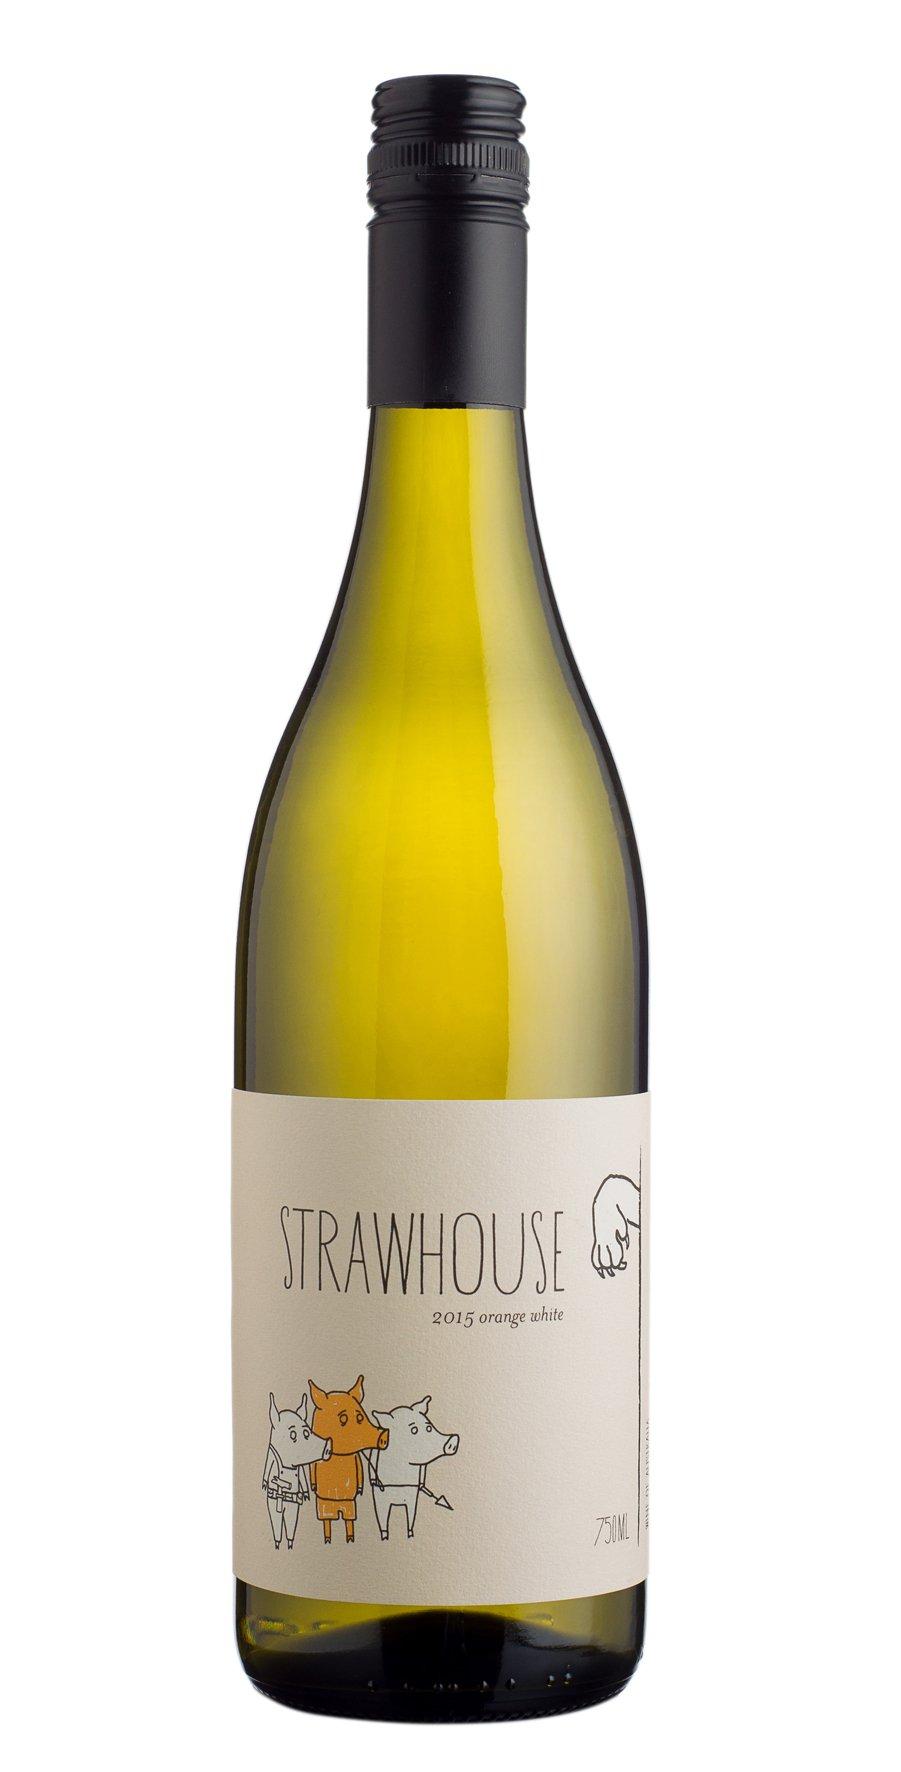 Strawhouse 2015 Semillon Sauvignon Blanc